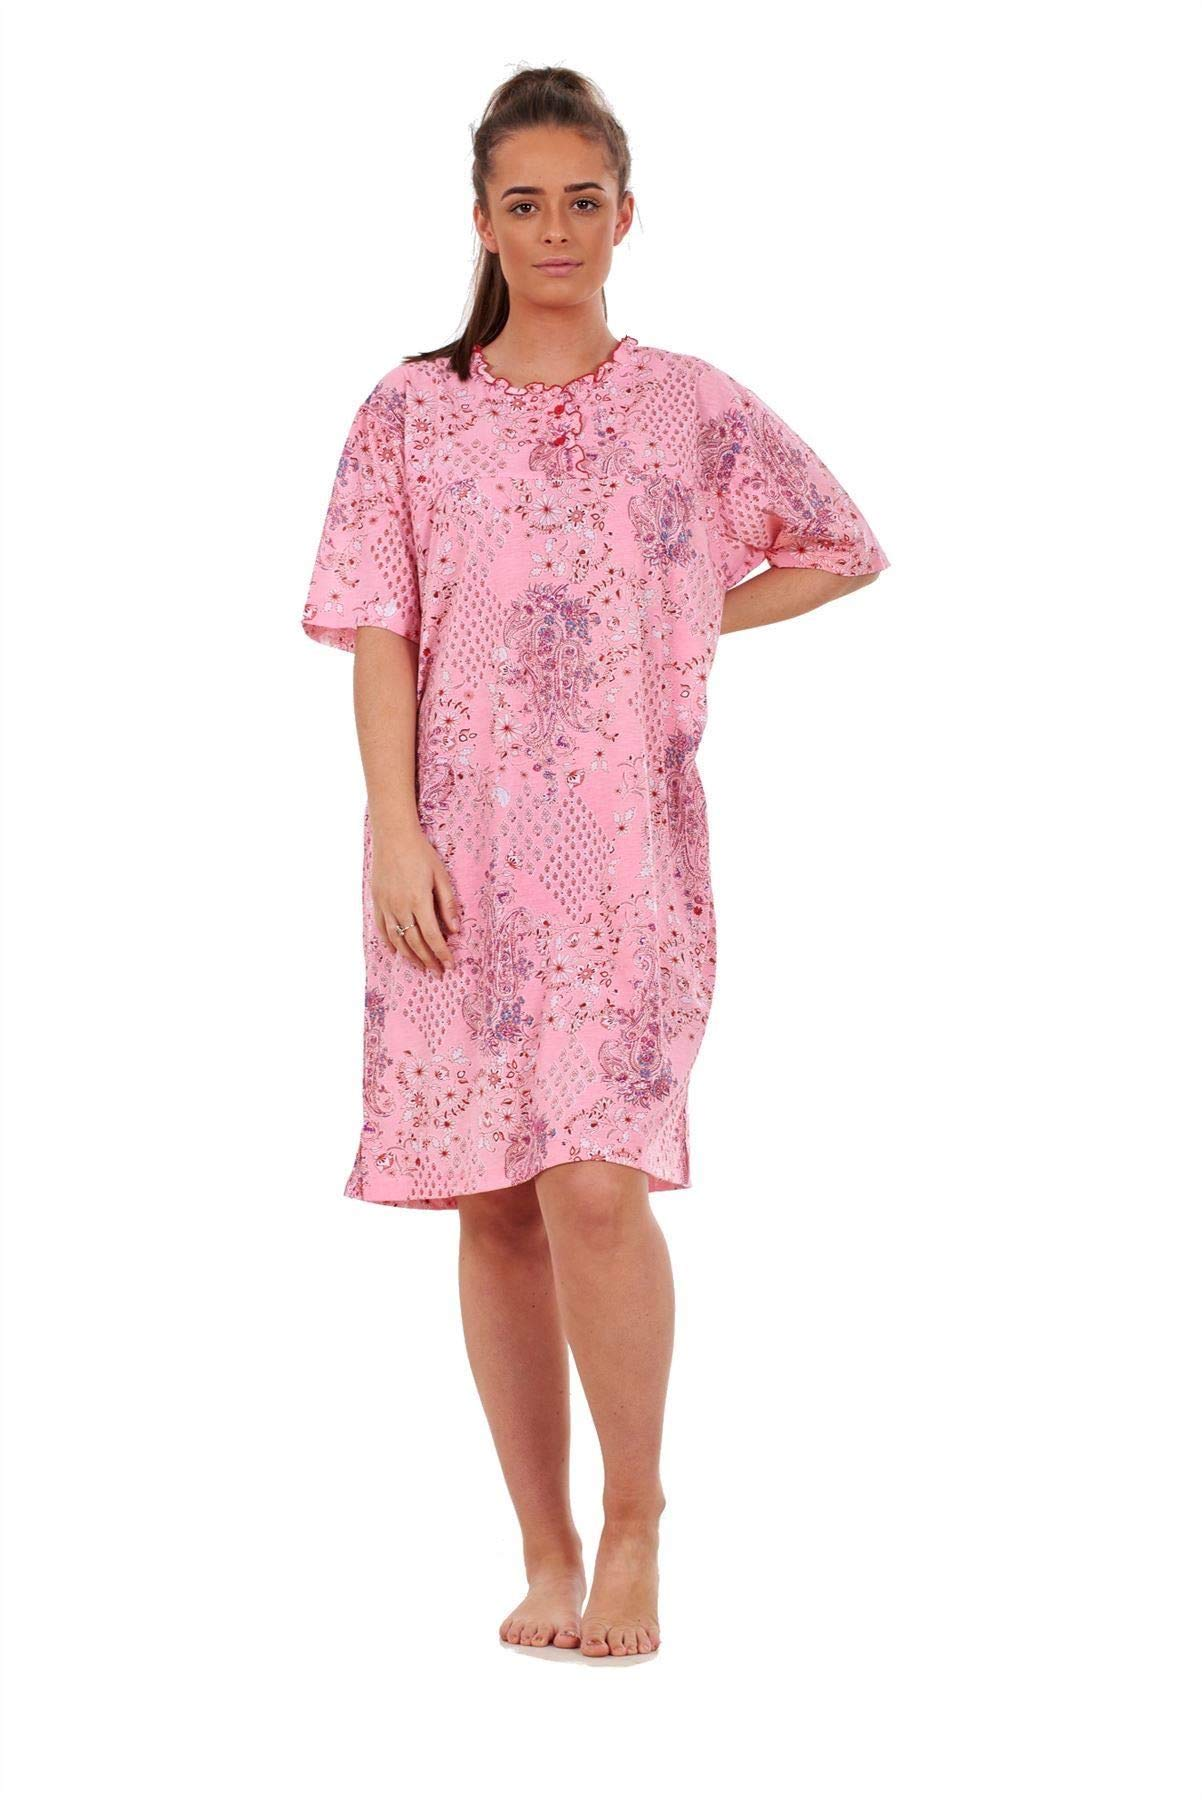 Knee Length Nightie Chemise Nightdress By Indigo Sky Magenta Pink 8//10 12//14